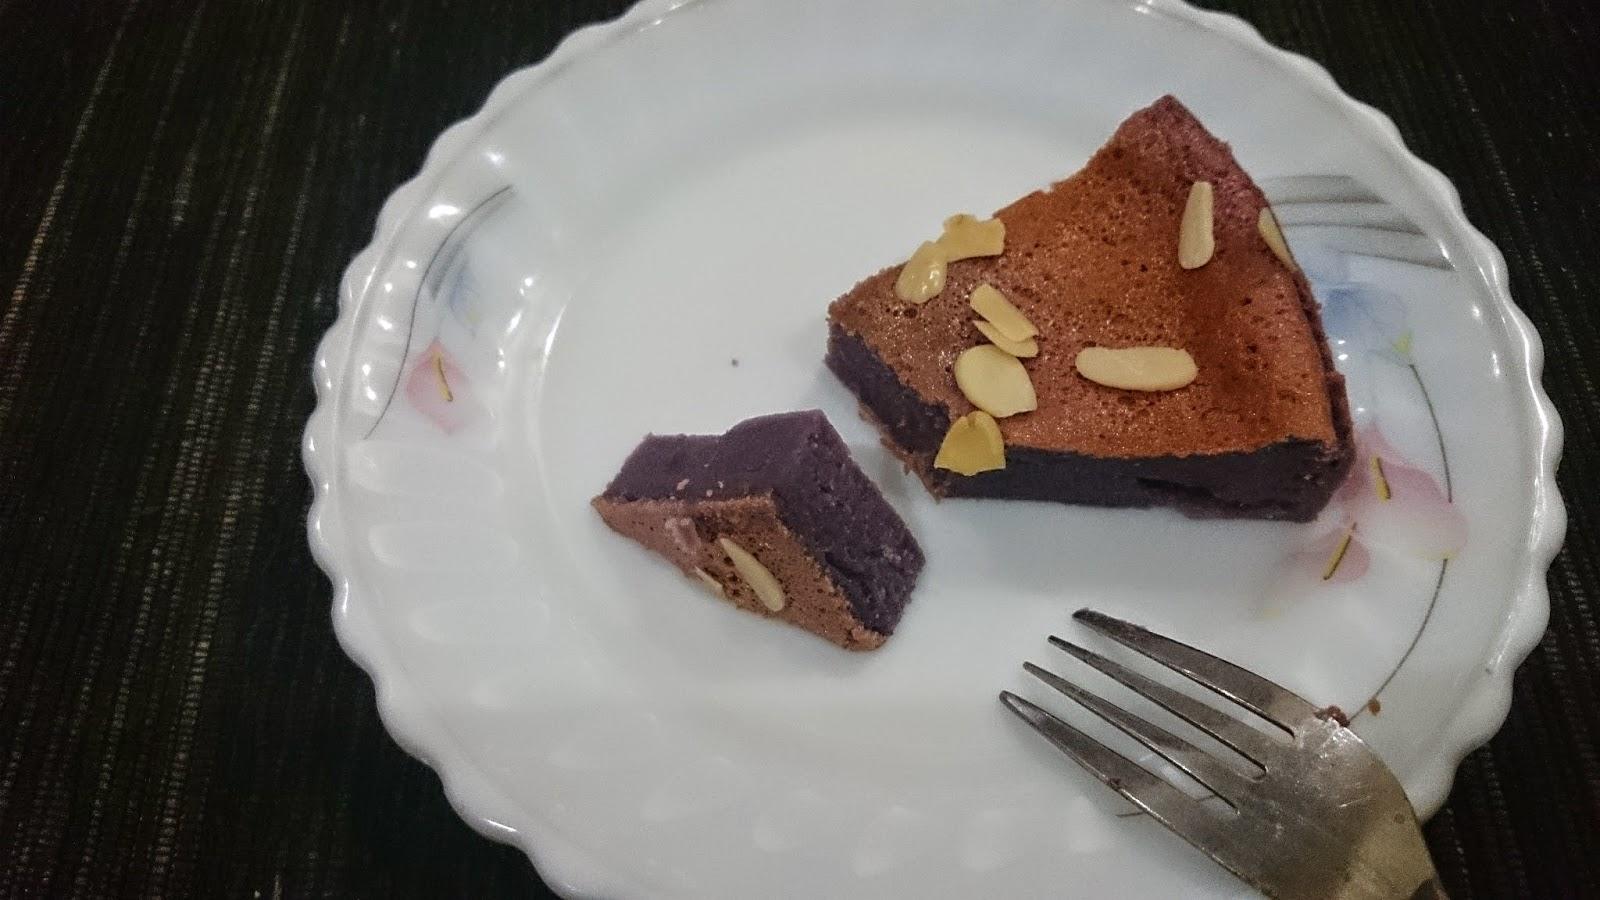 Resep Cake Ubi Ungu Kukus Sajian Sedap: Rumah Makan DJOWO KLATEN: BINGKA UBI UNGU JEPANG